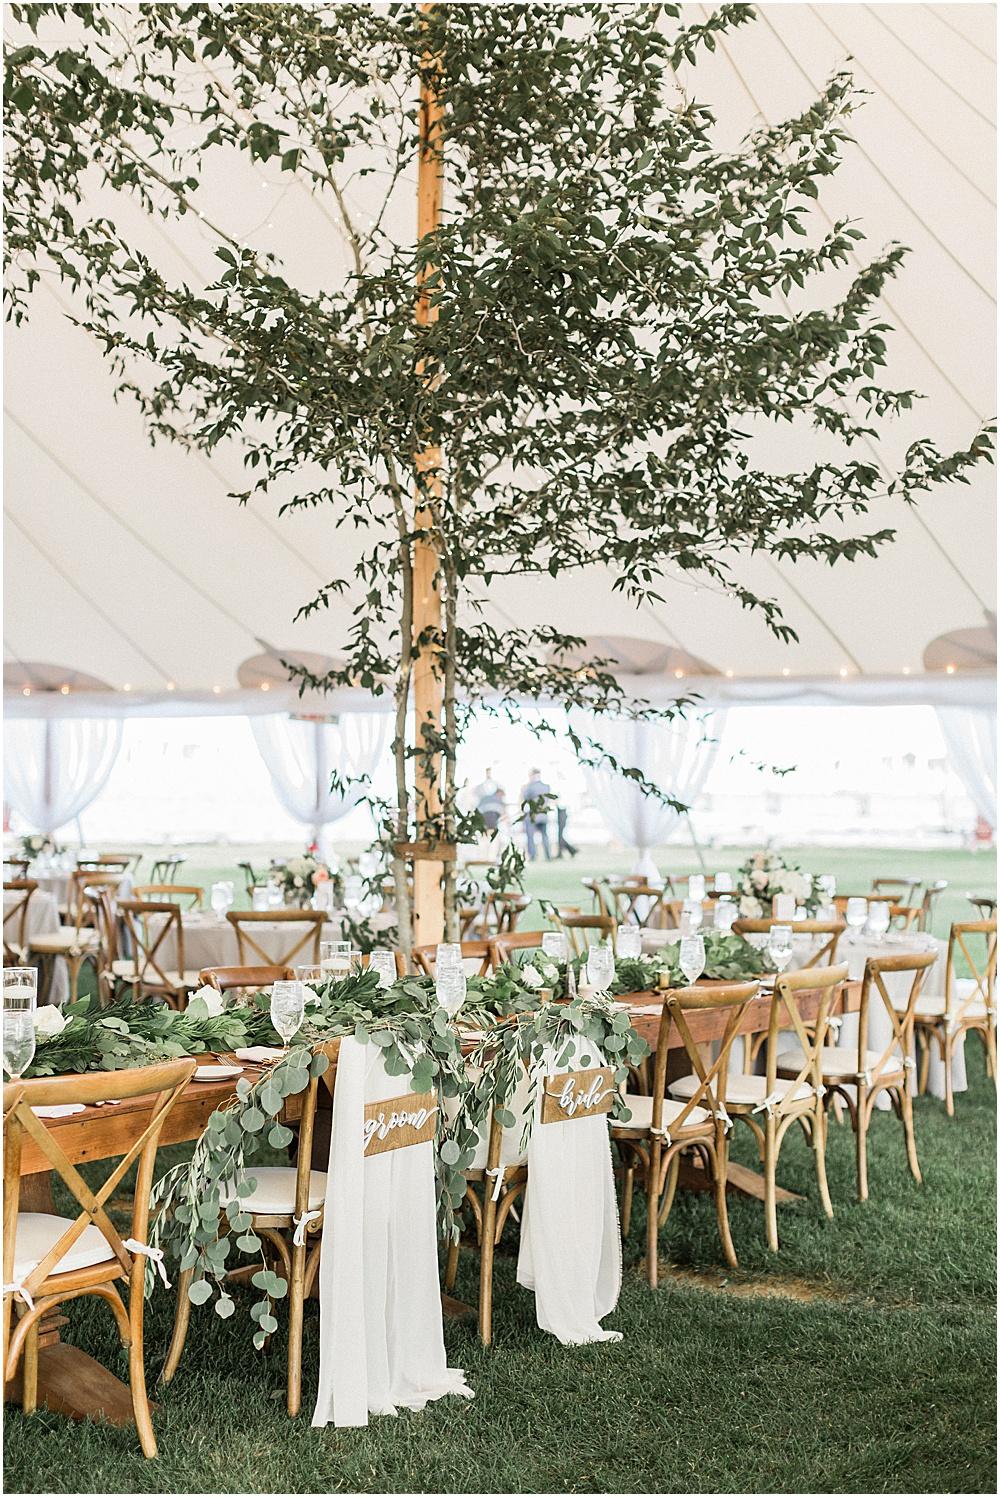 tabor_academy_rebecca_chris_tented_interior_trees_engagement_session_cape_cod_massachusetts_boston_wedding_photographer_meredith_jane_photography_photo_0717.jpg